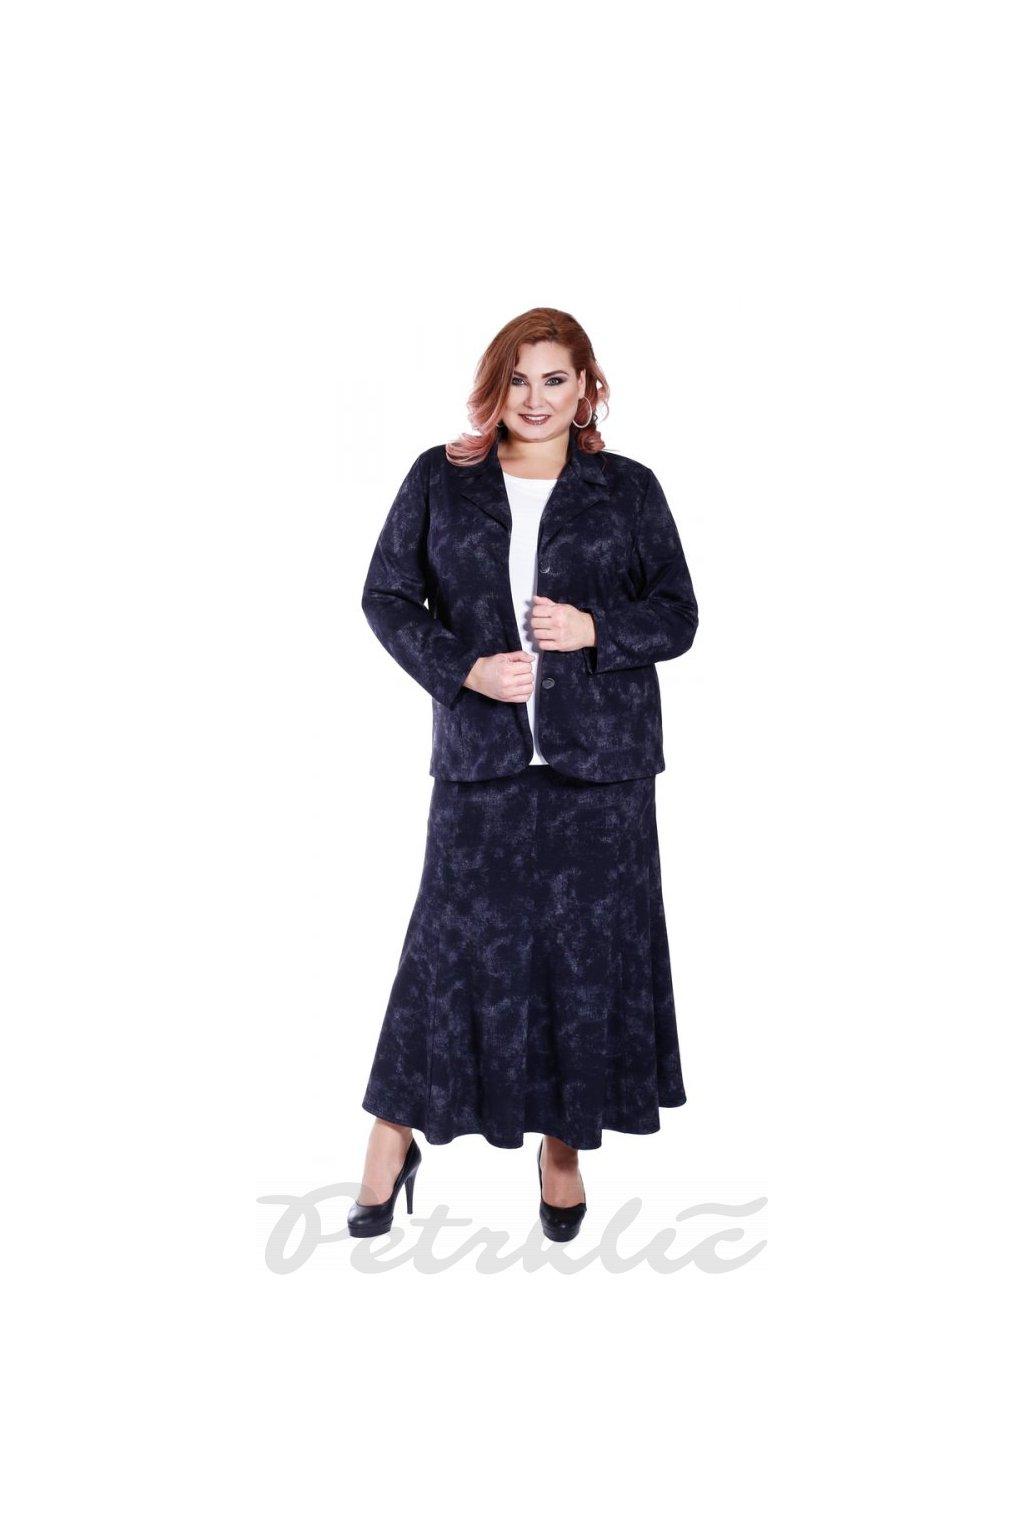 BABETA - sukně 70 - 75 cm